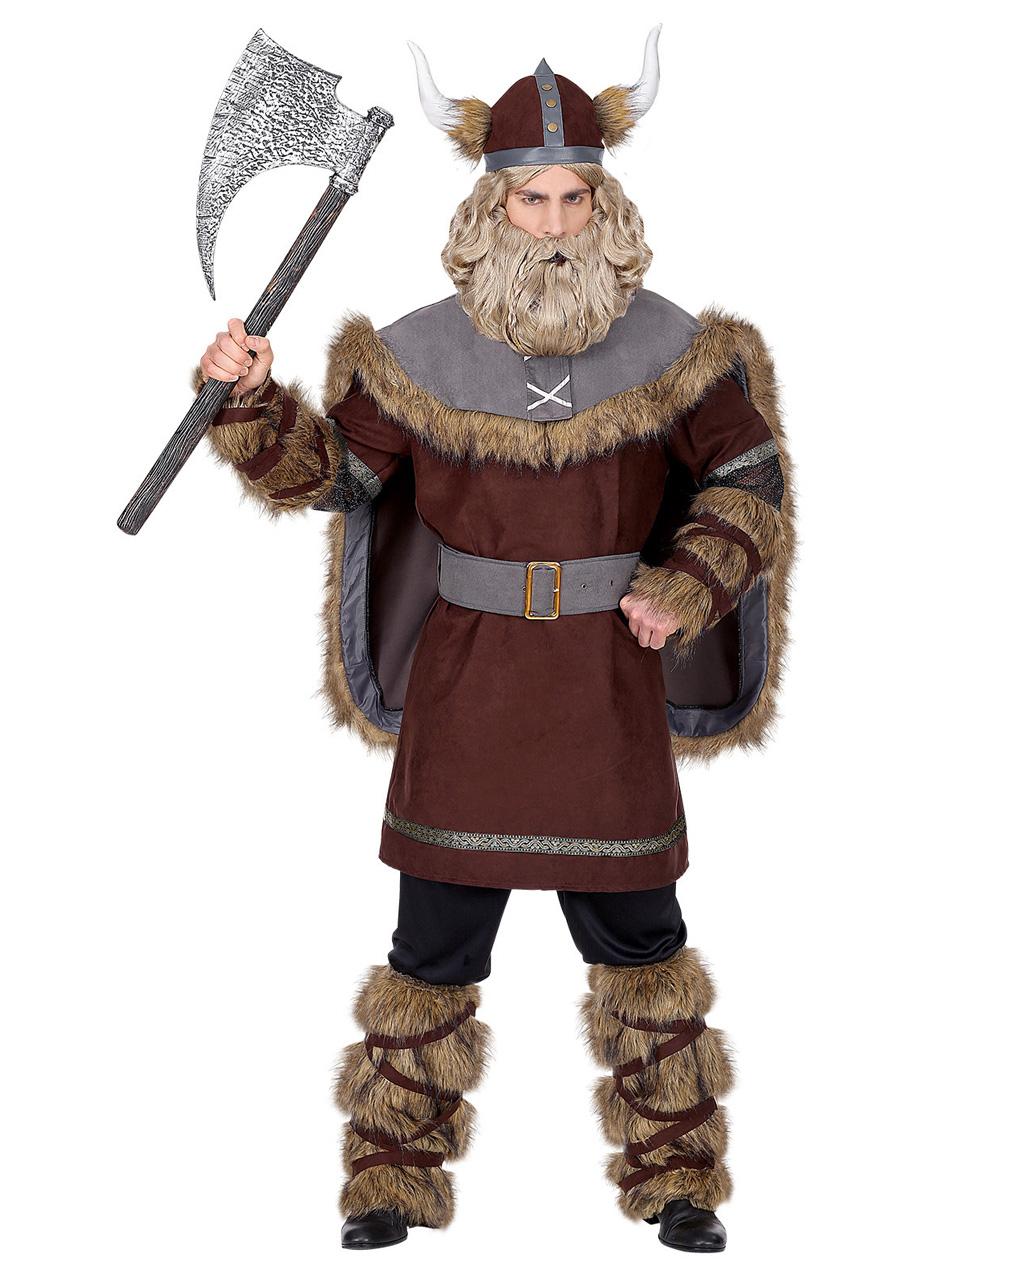 5 Tlg Wikinger Herren Kostum Fur Fasching Kaufen Karneval Universe